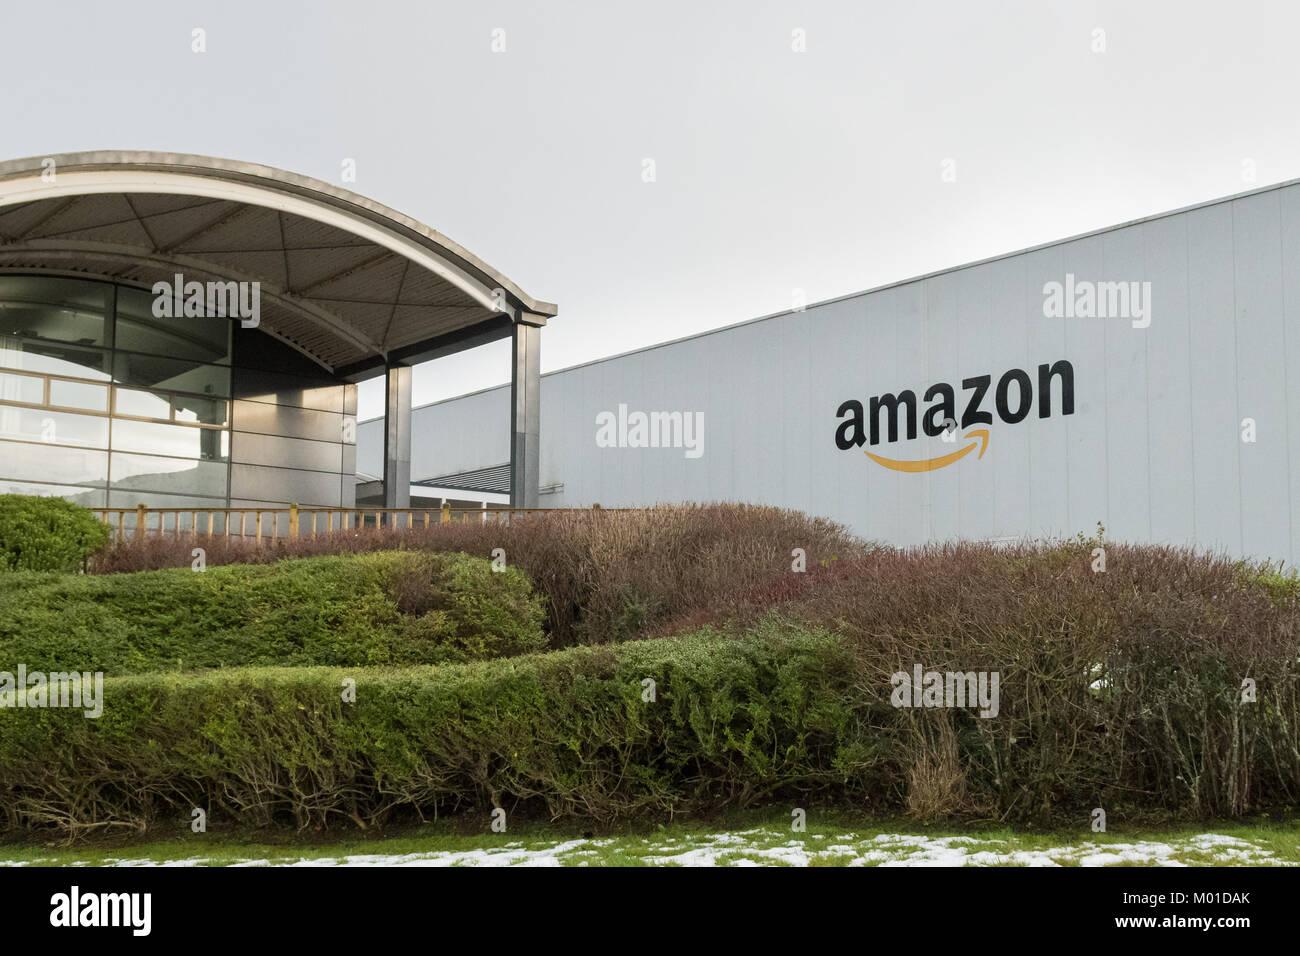 Amazon warehouse at Gourock Greenock, Inverclyde, Scotland, UK - Stock Image